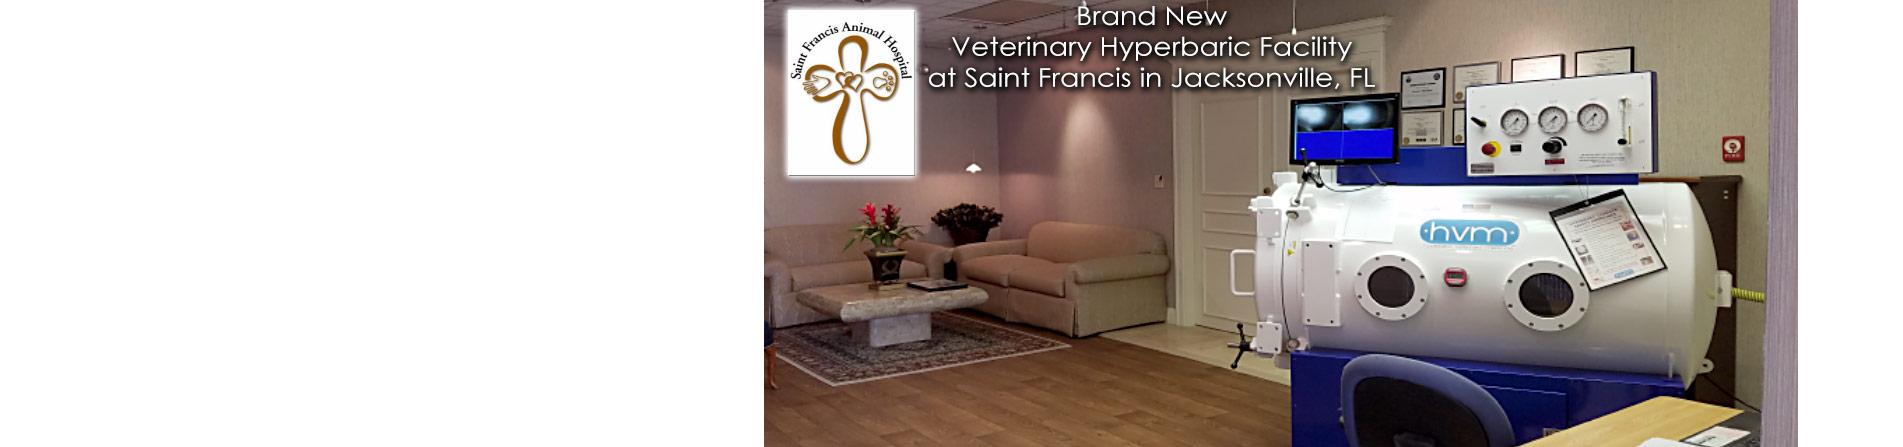 Saint Francis New HBOT Facility